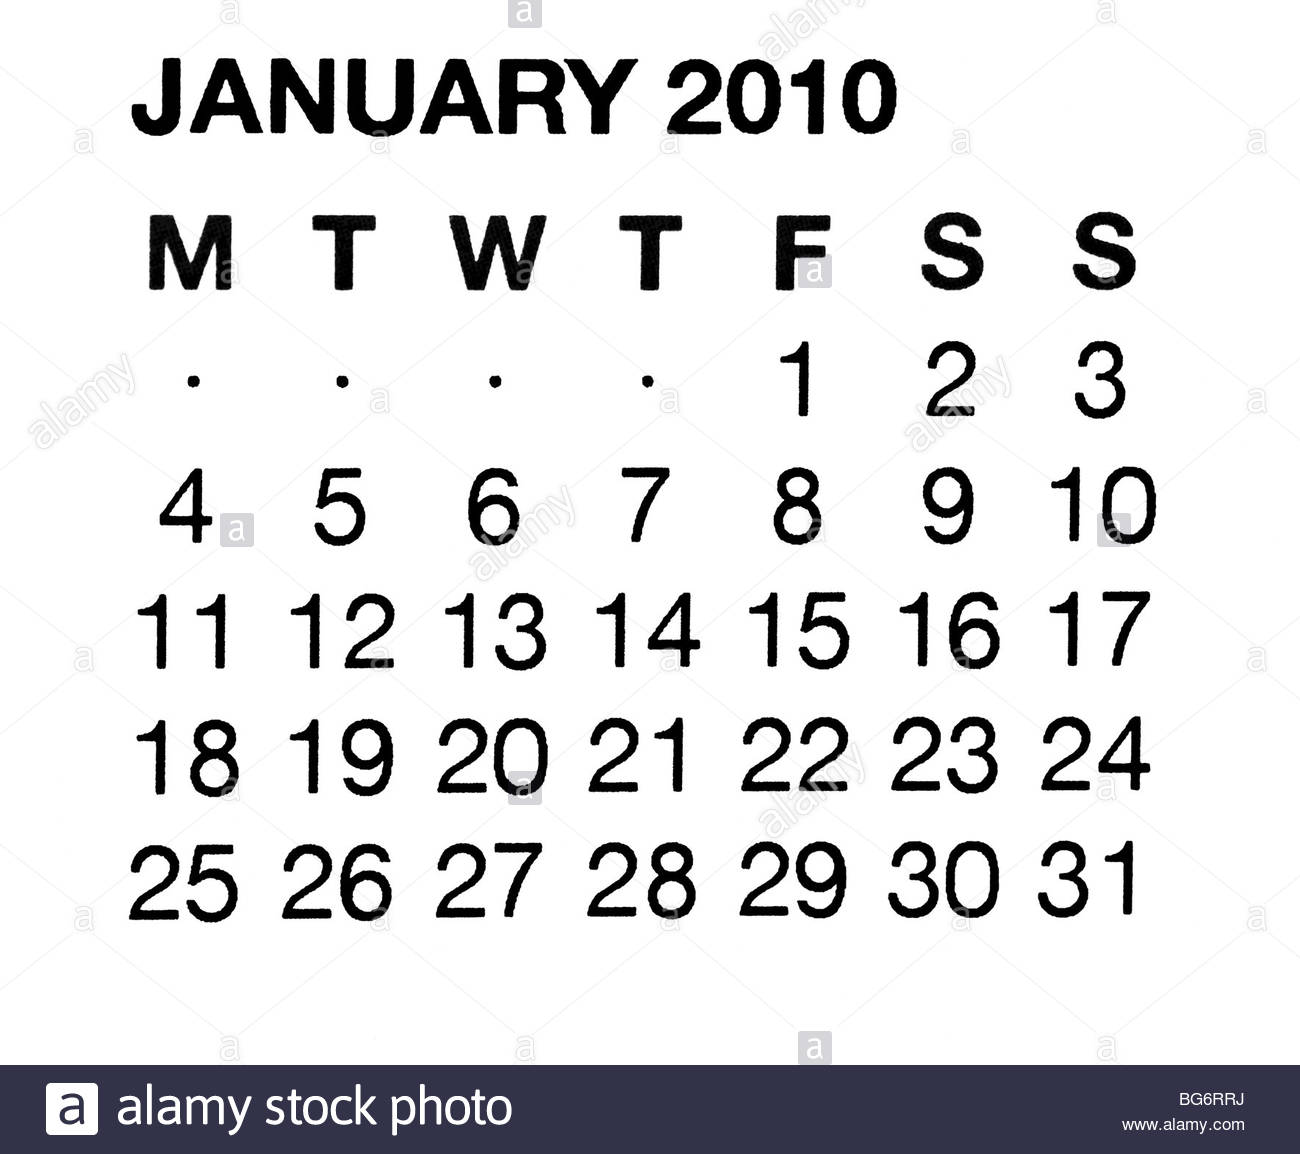 January 2010 calendar - Stock Image